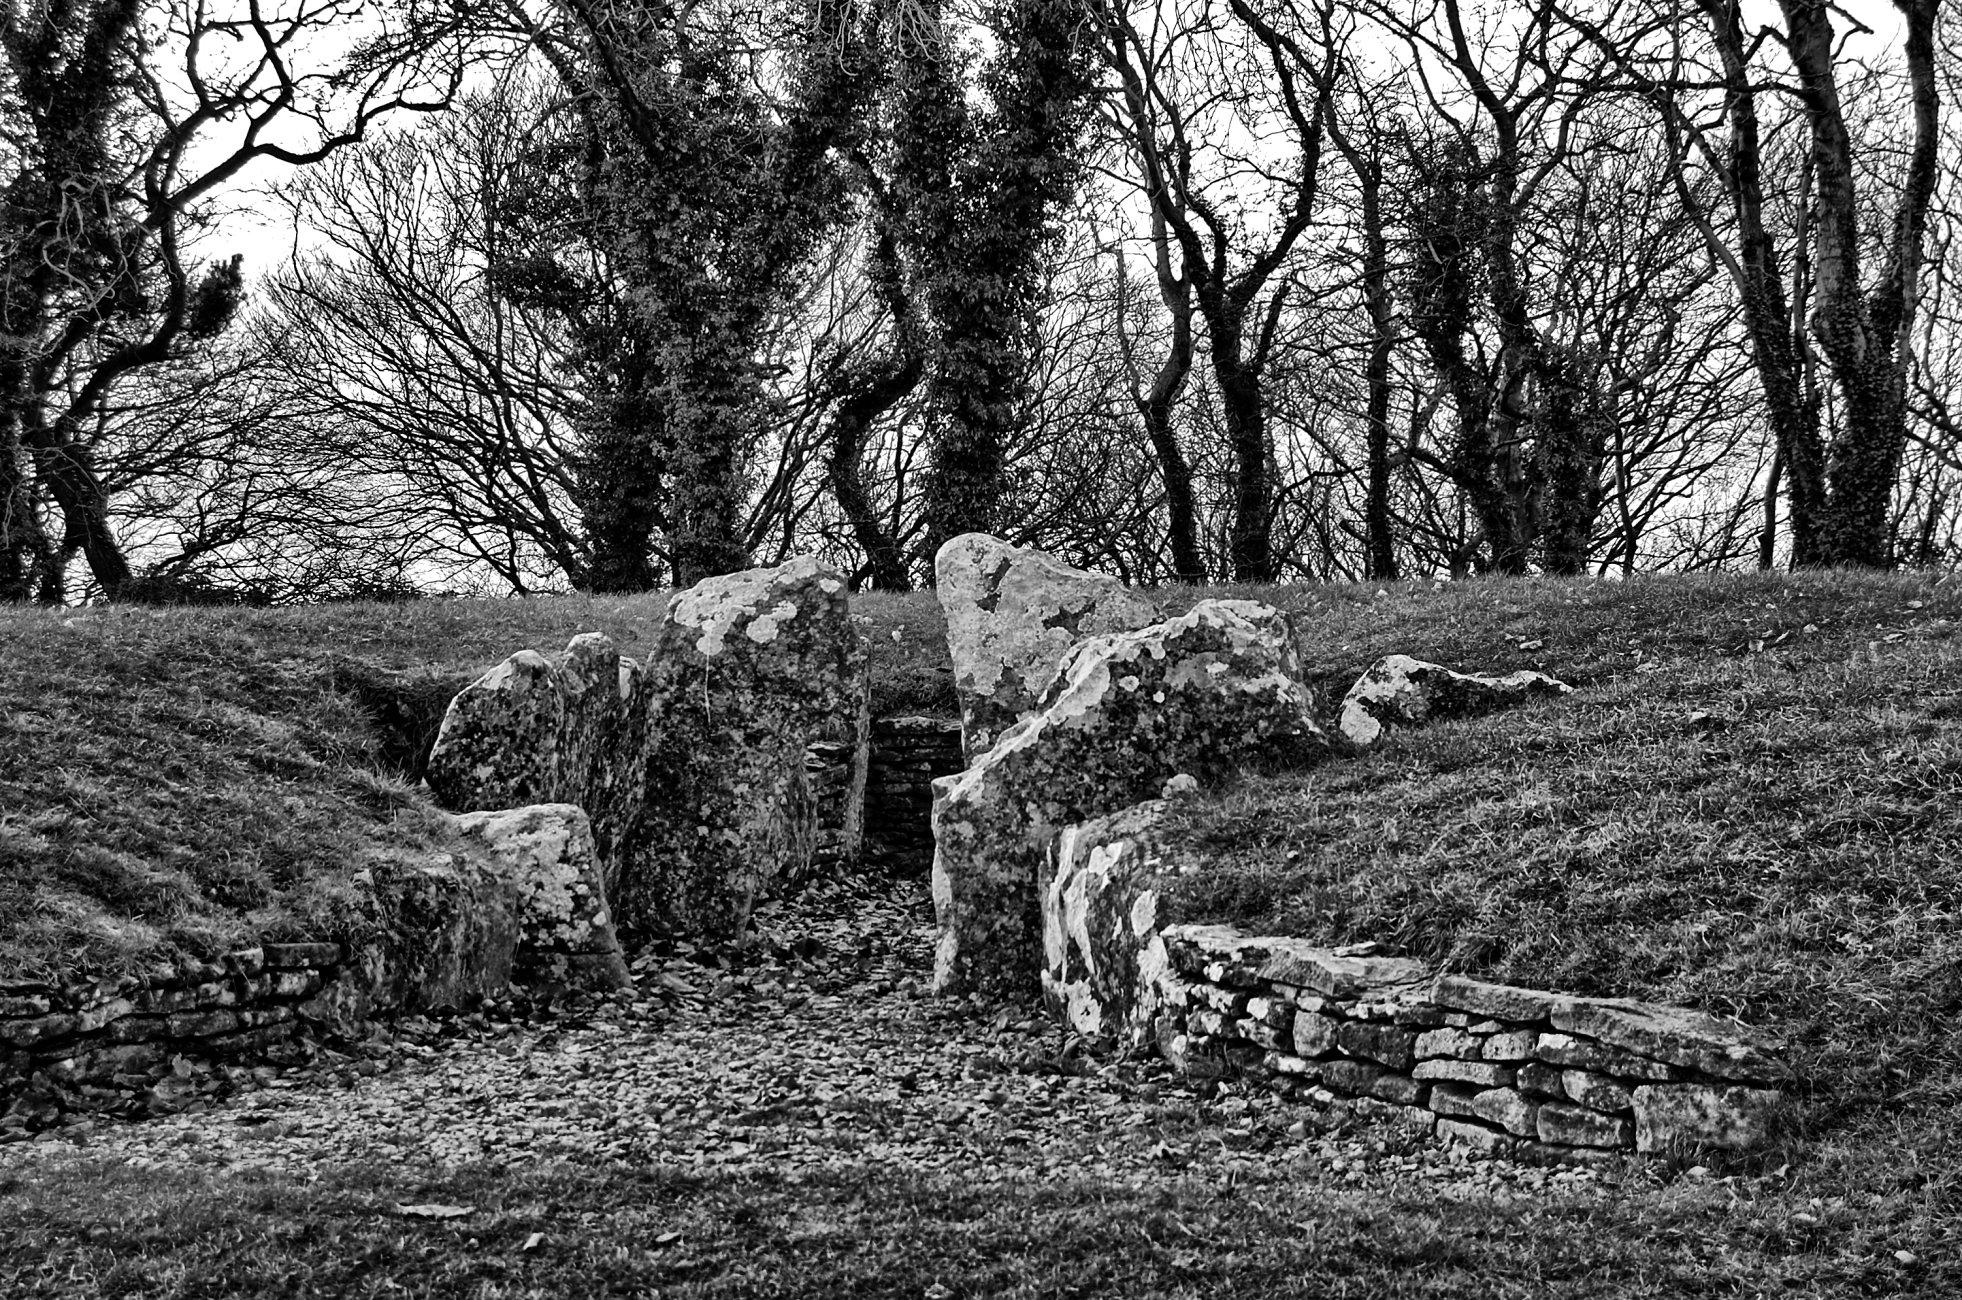 Nympsfield Long Barrow